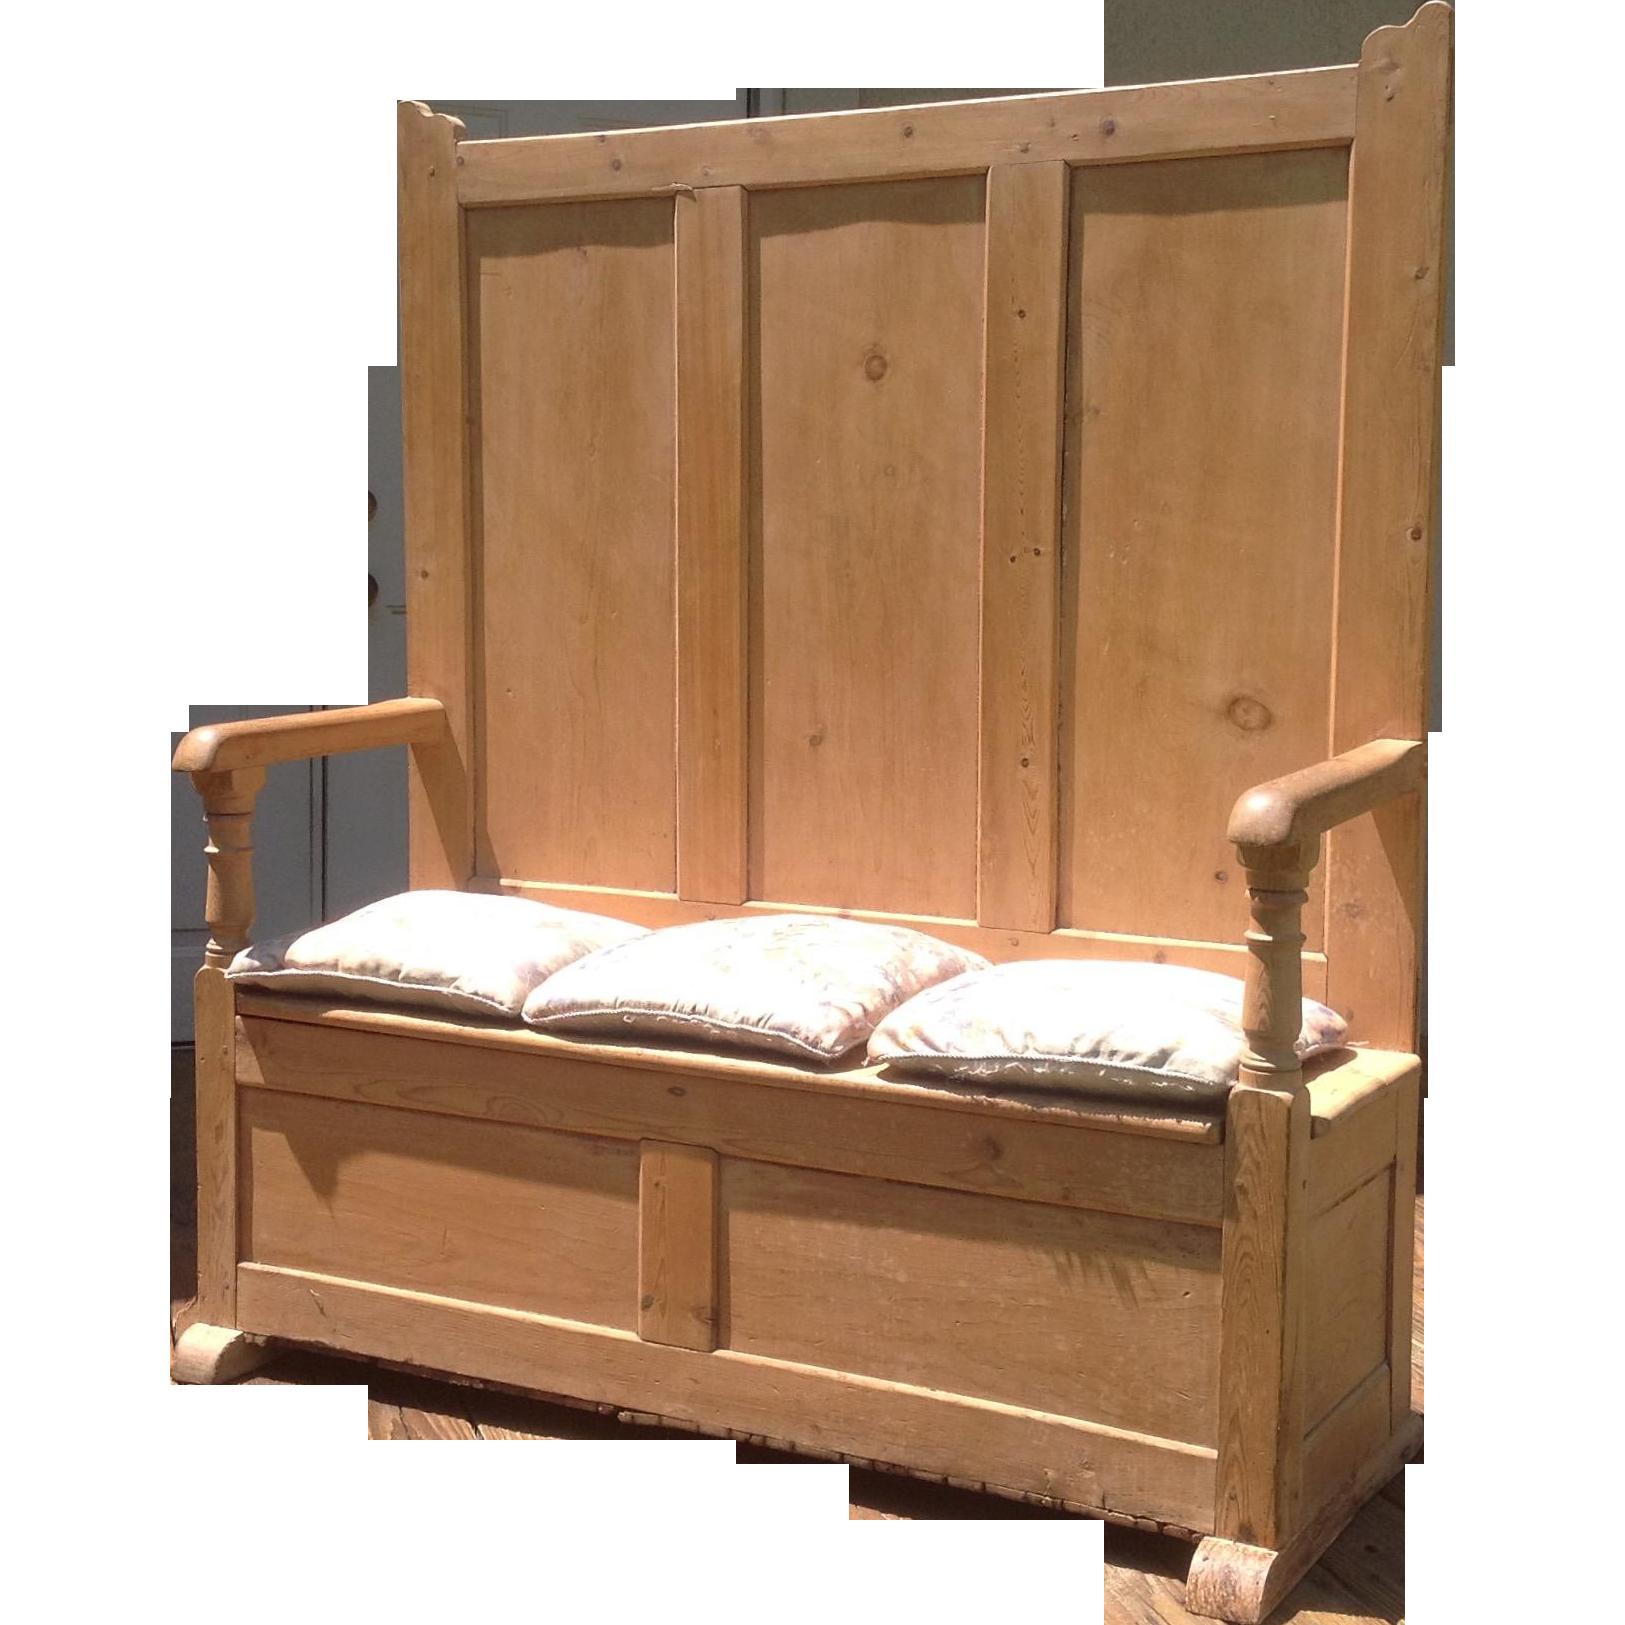 18th c. British Settle Bench